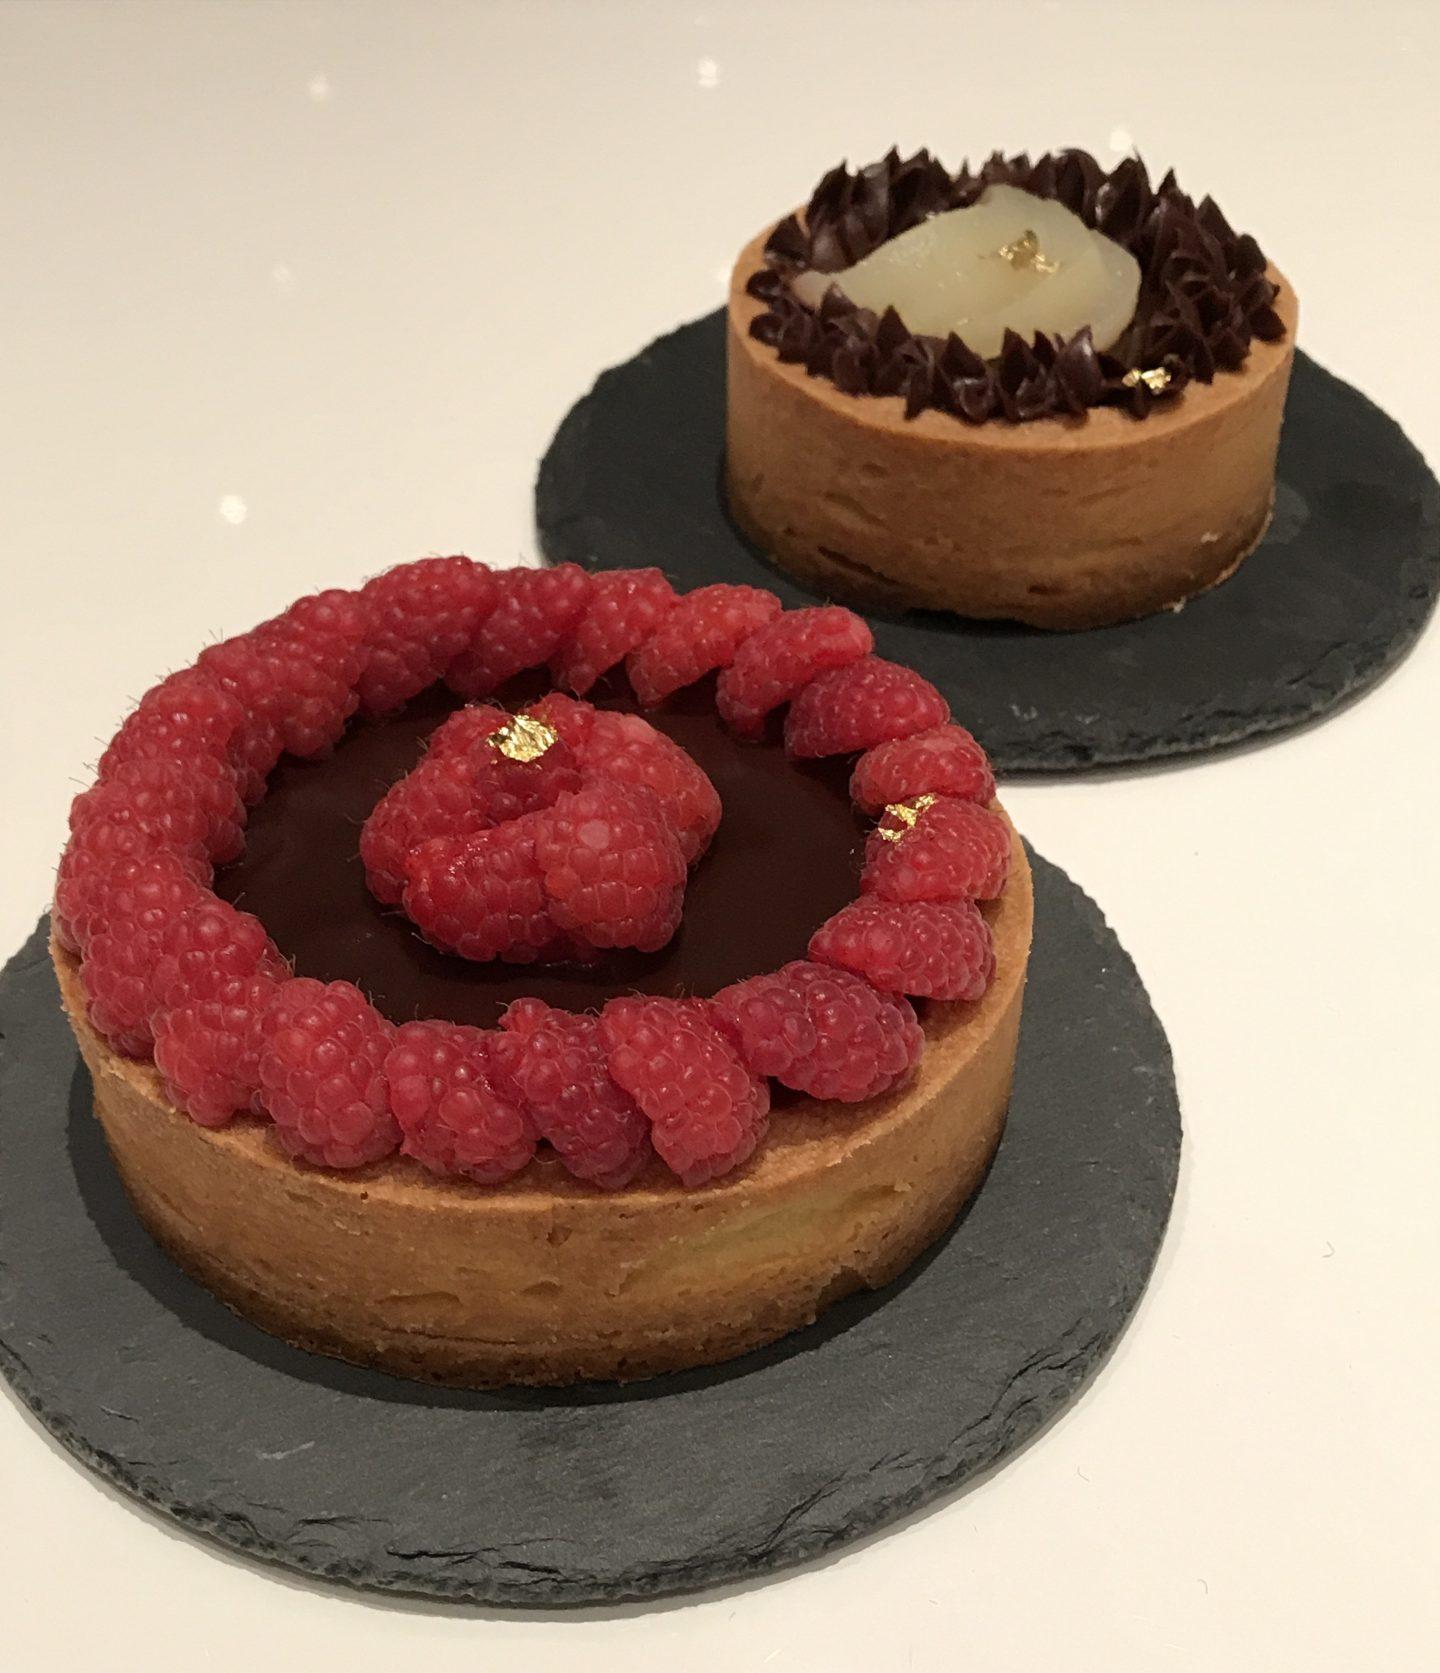 Tre tarte cioccolatose…